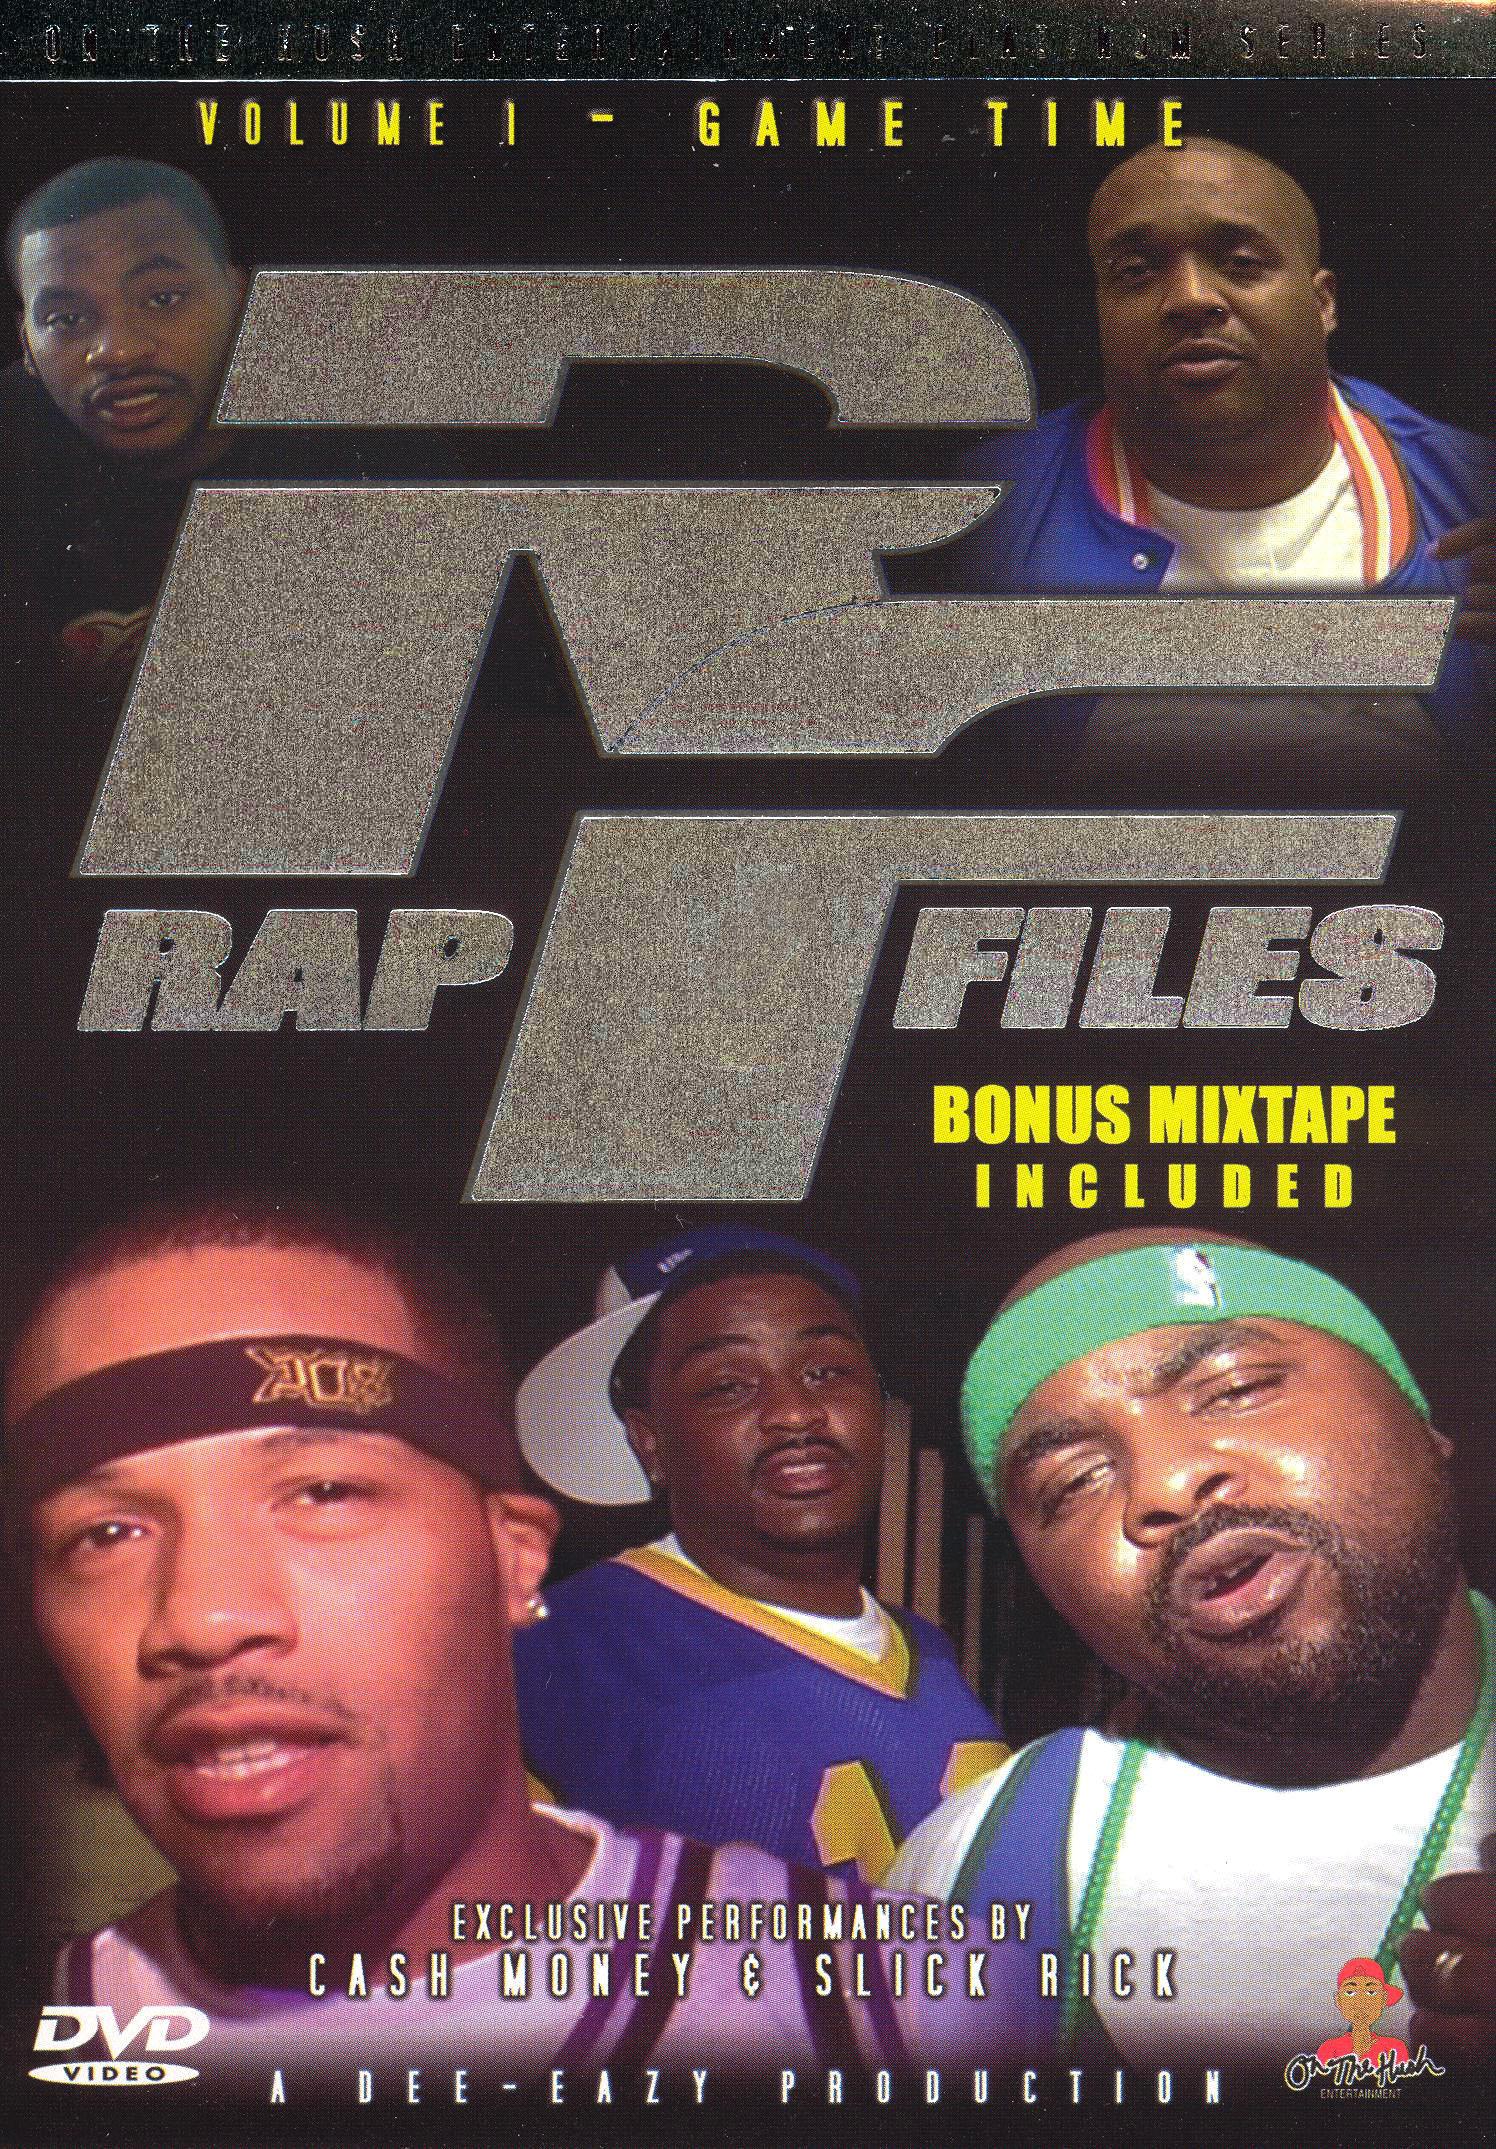 Rap Files, Vol. 1: Game Time